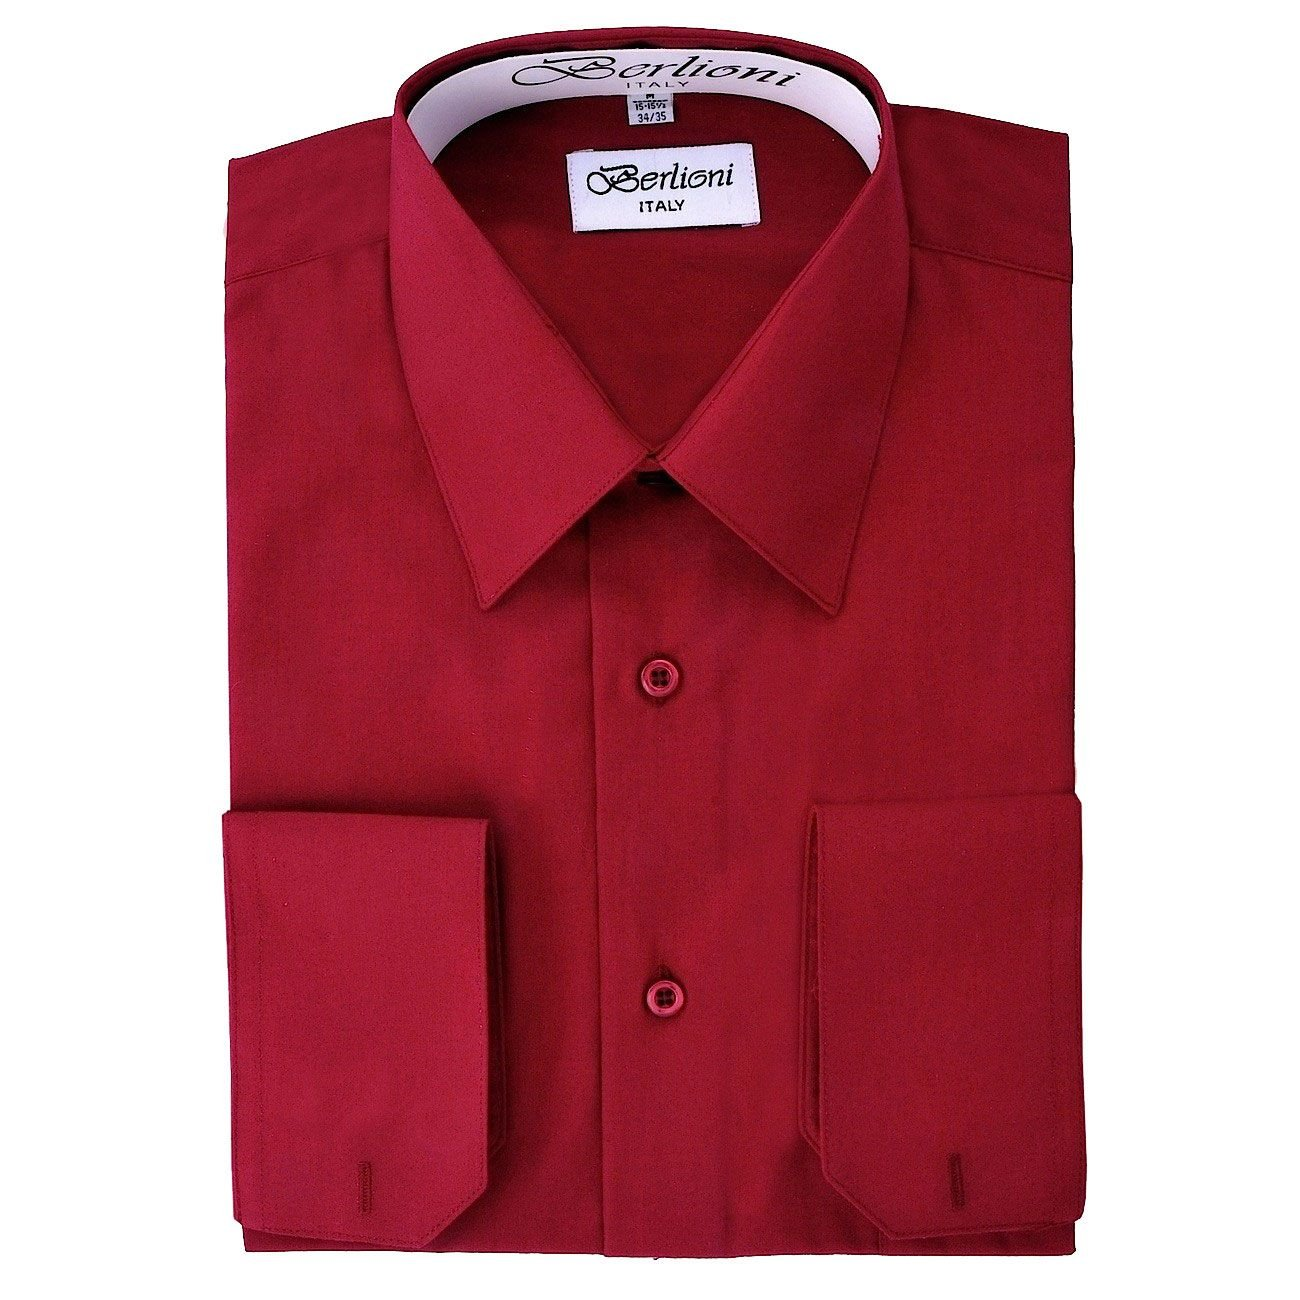 Mens Burgundy Solid Dress Shirt